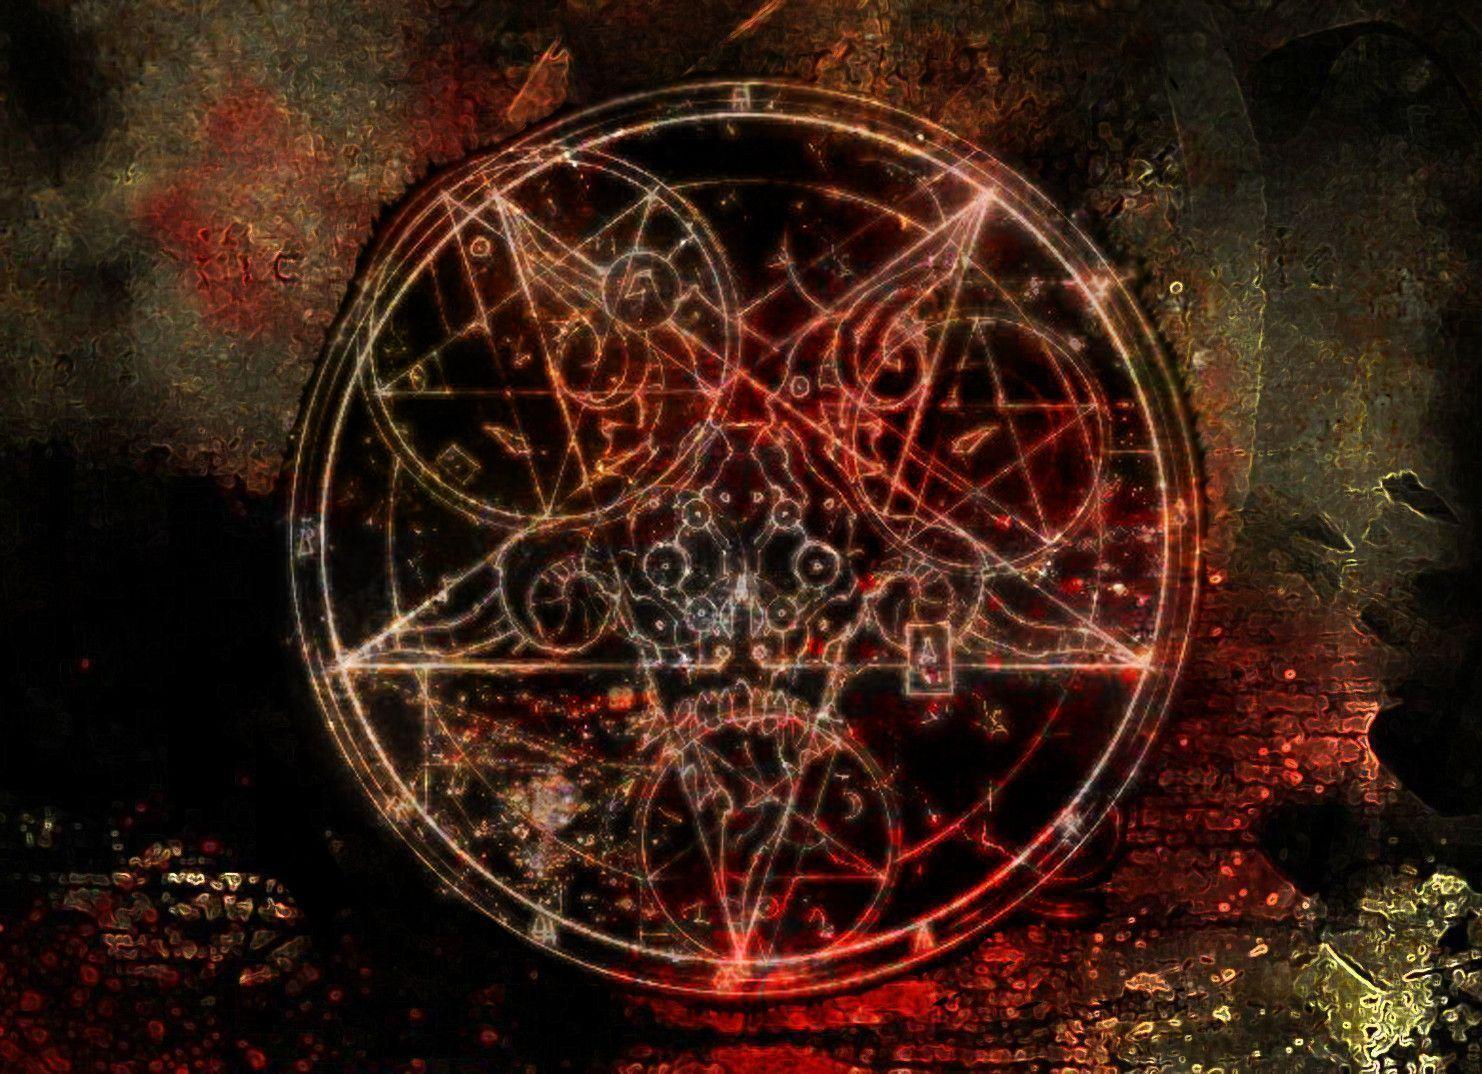 Magnusharvest Summoning Of A Demon Wallpaper